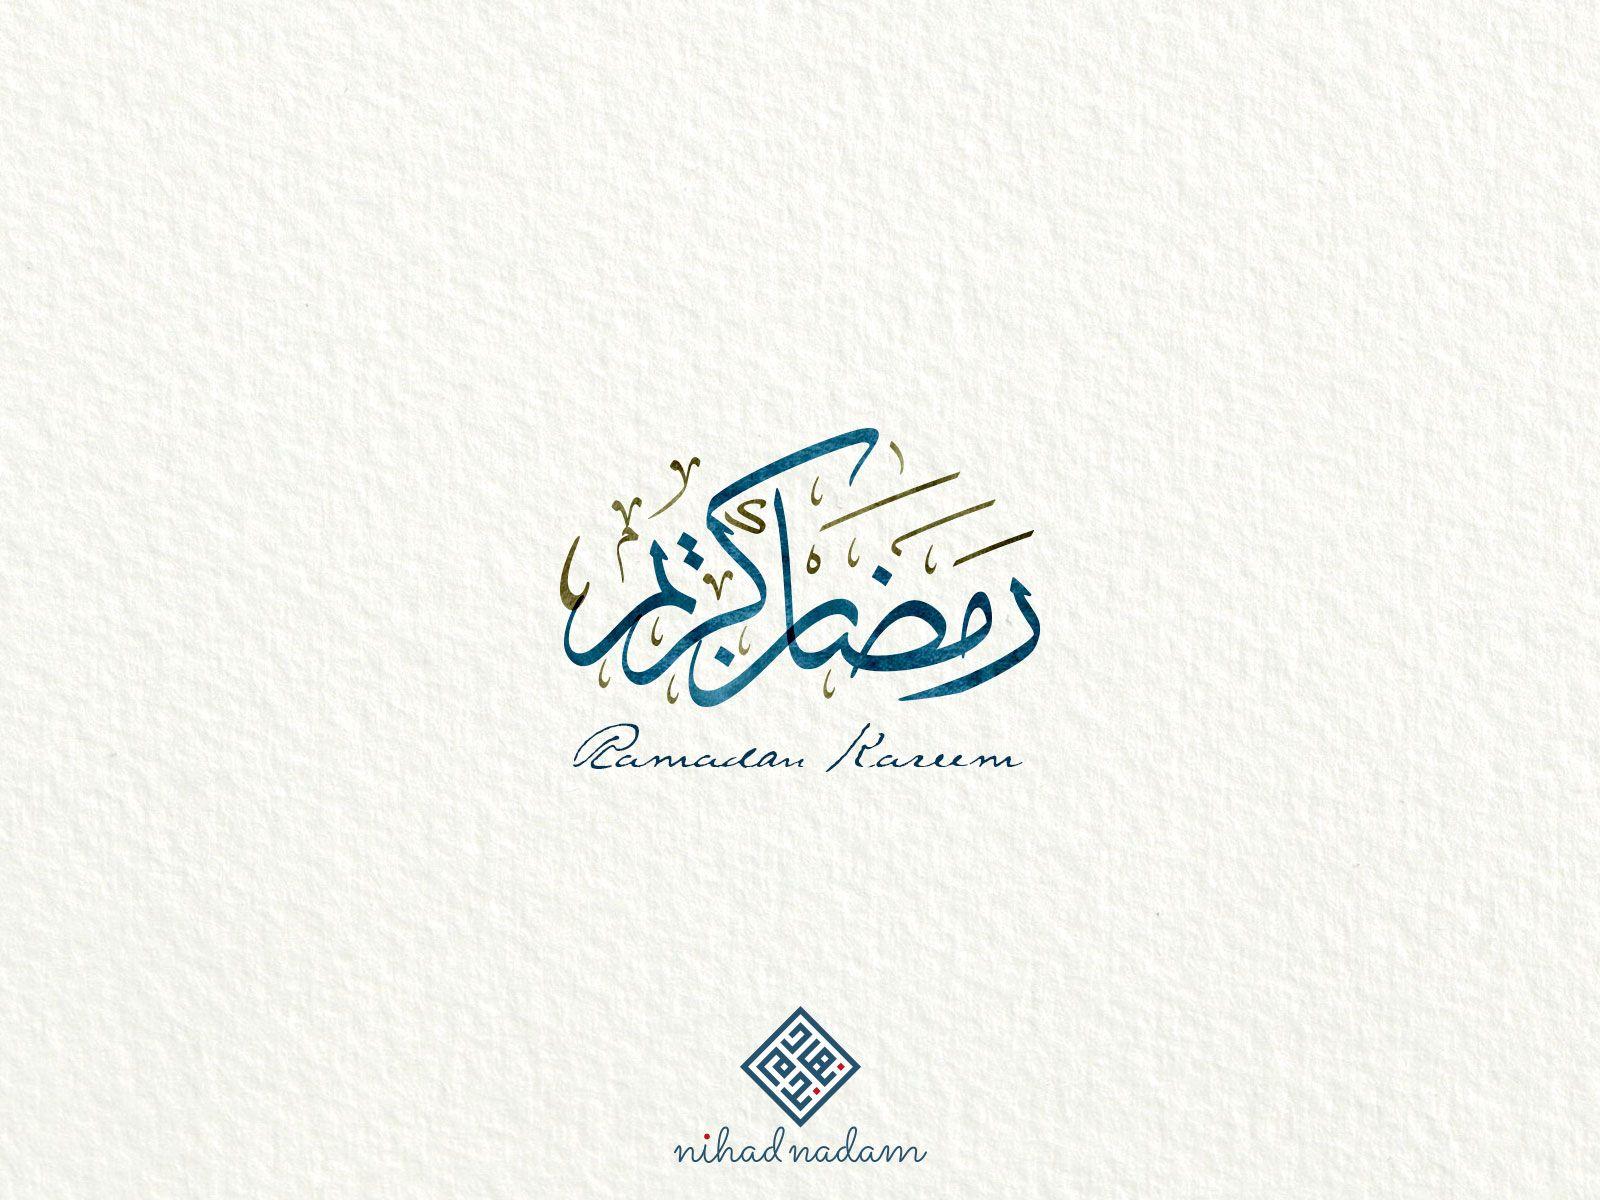 Ramadan 2020 Free Designs Arabic Design تصاميم رمضان كريم للتحميل المجاني Ramadan Free Design Ramadan Kareem Vector